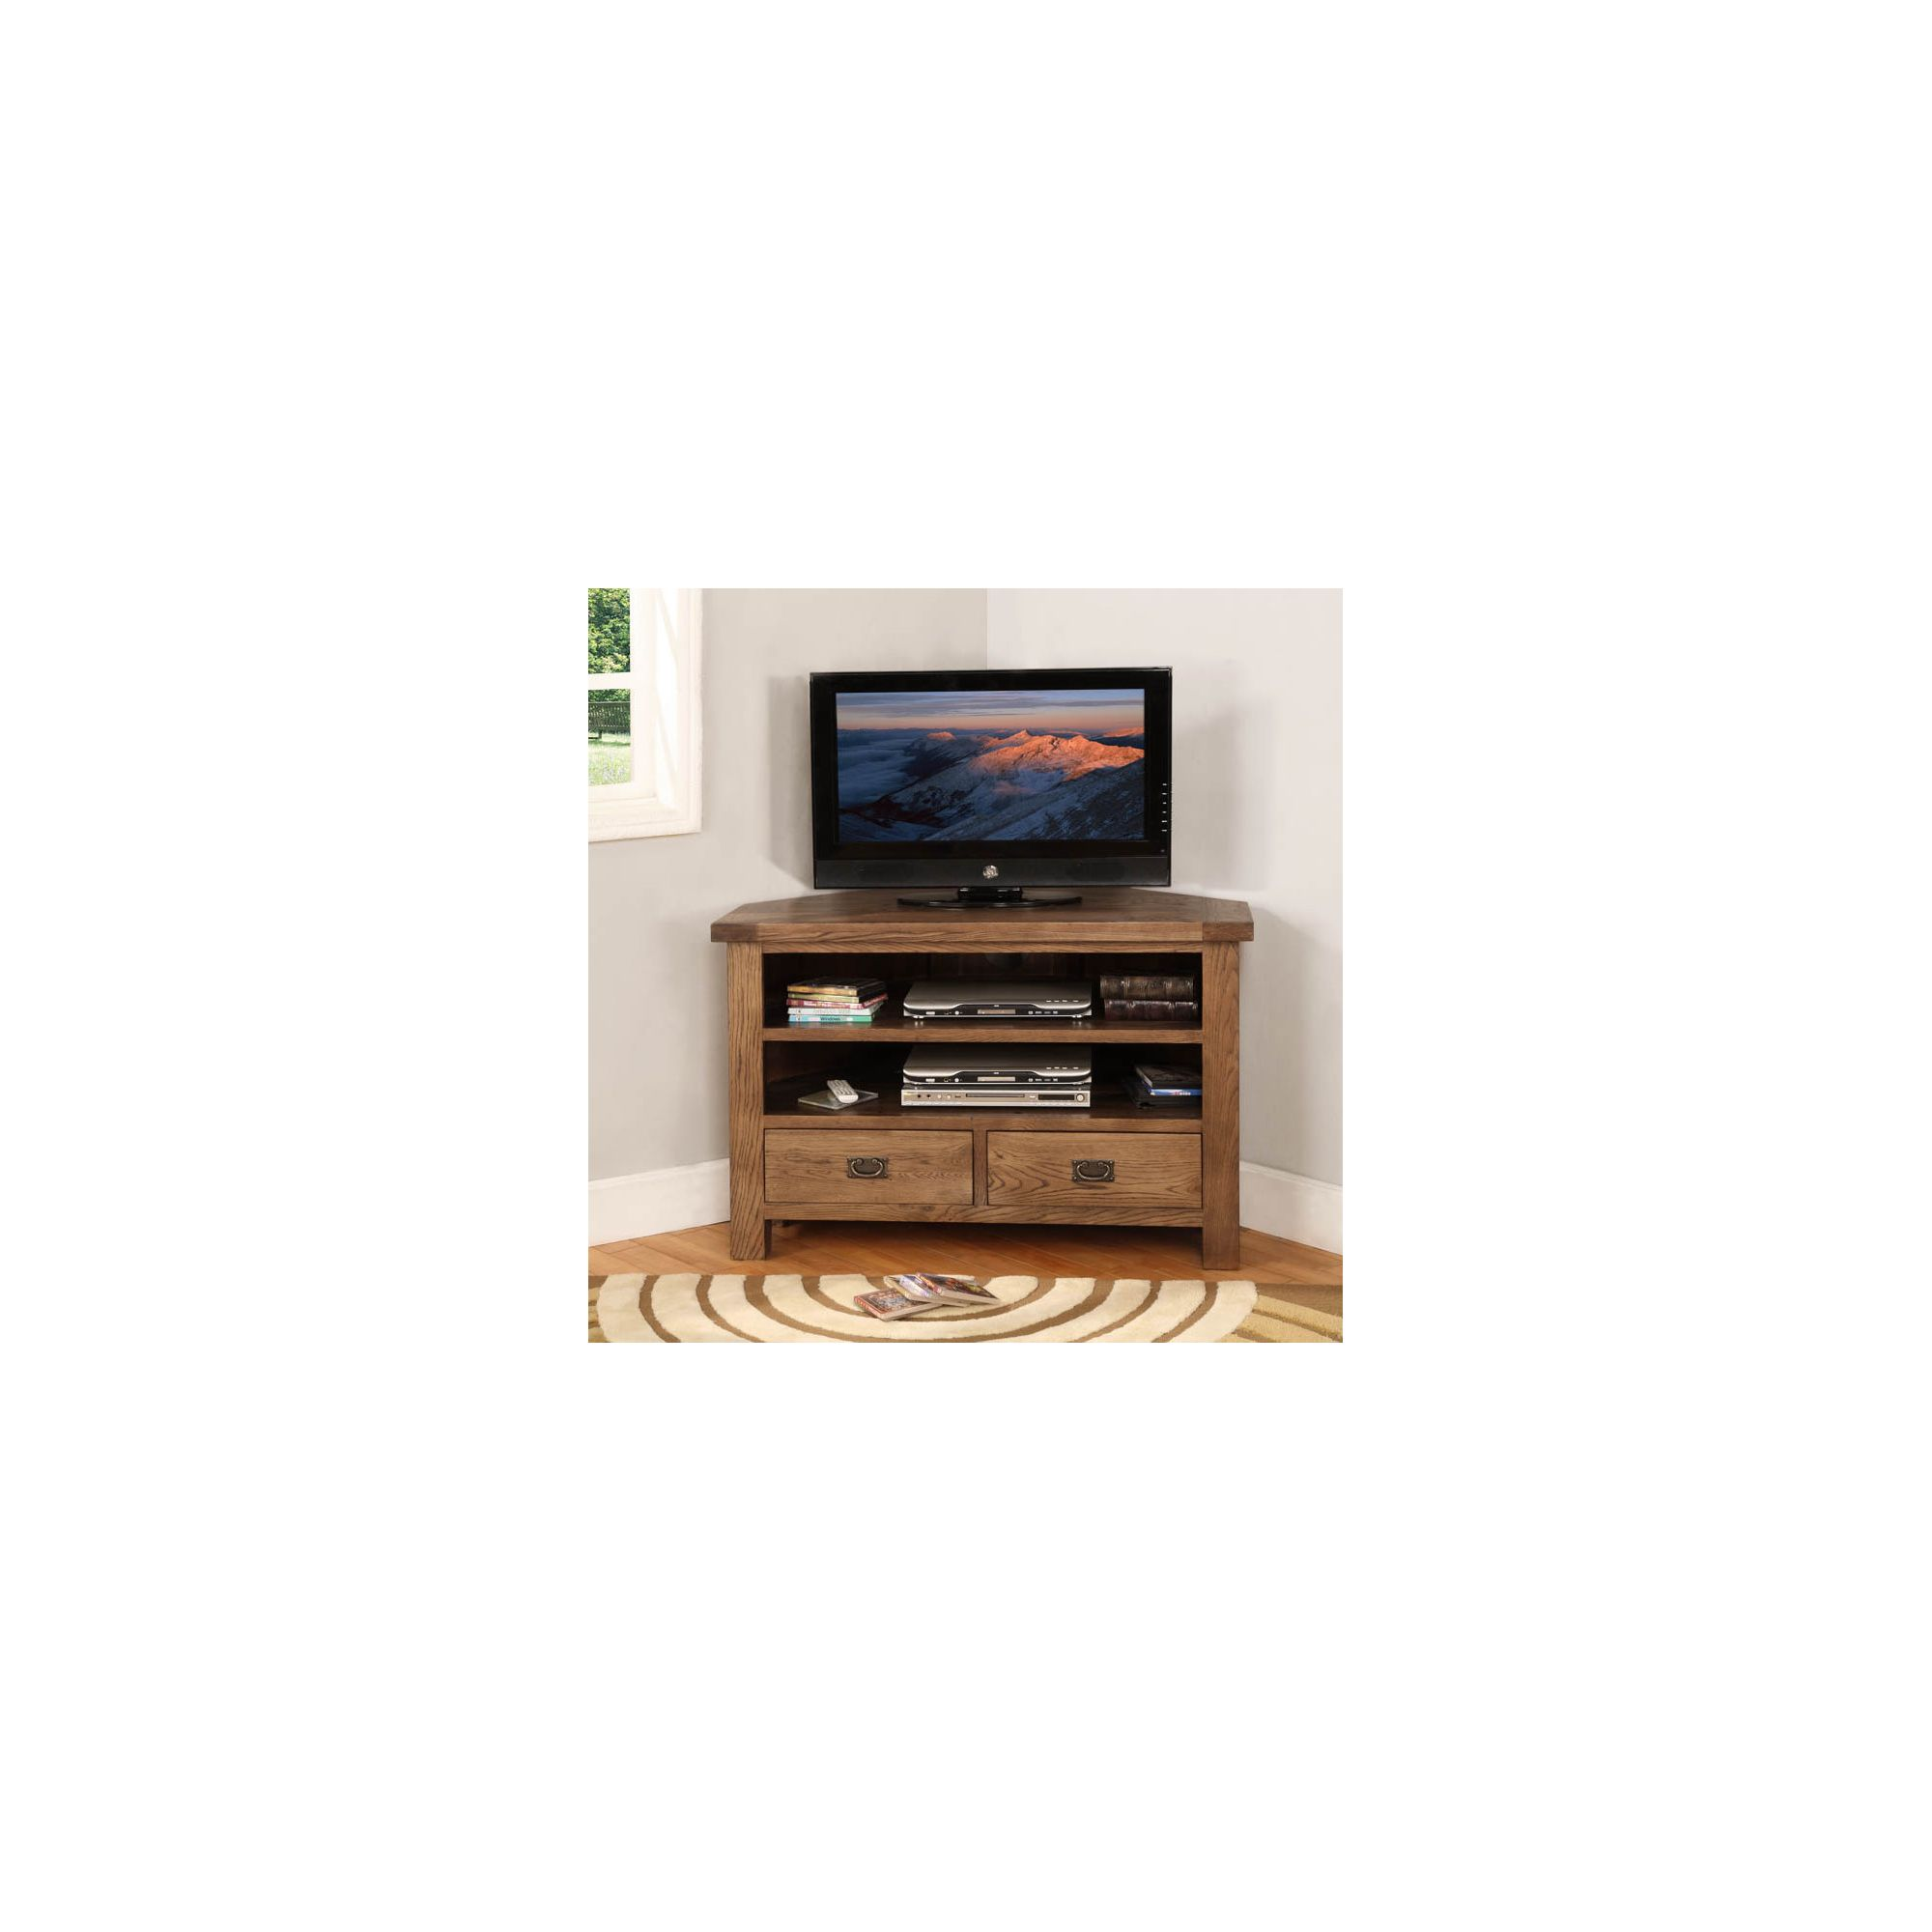 Hawkshead Broadway Wooden Corner TV Cabinet at Tesco Direct